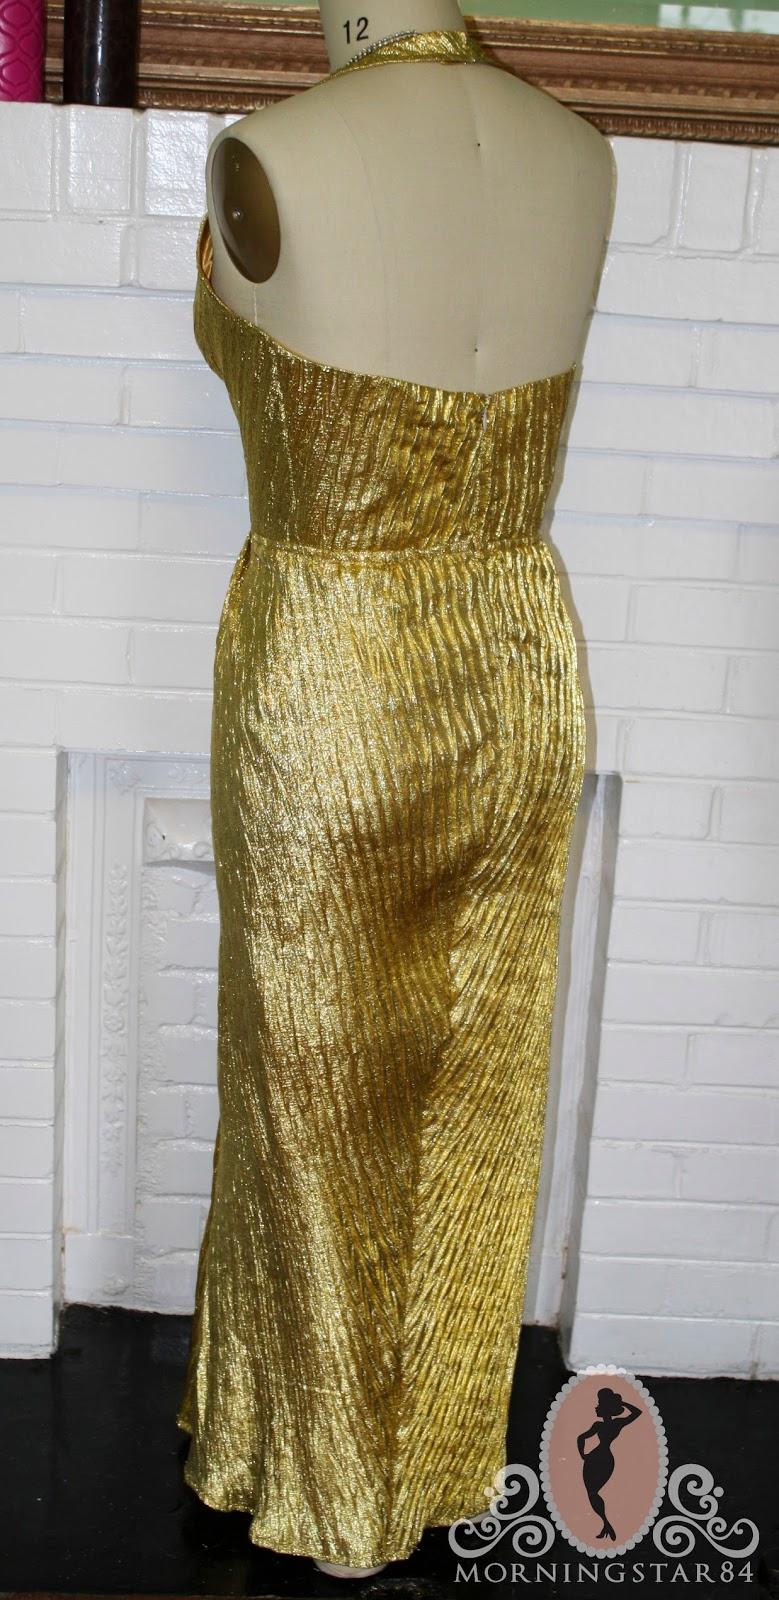 Morningstar Pinup Marilyn Monroe Gold Lame Dress Simplified